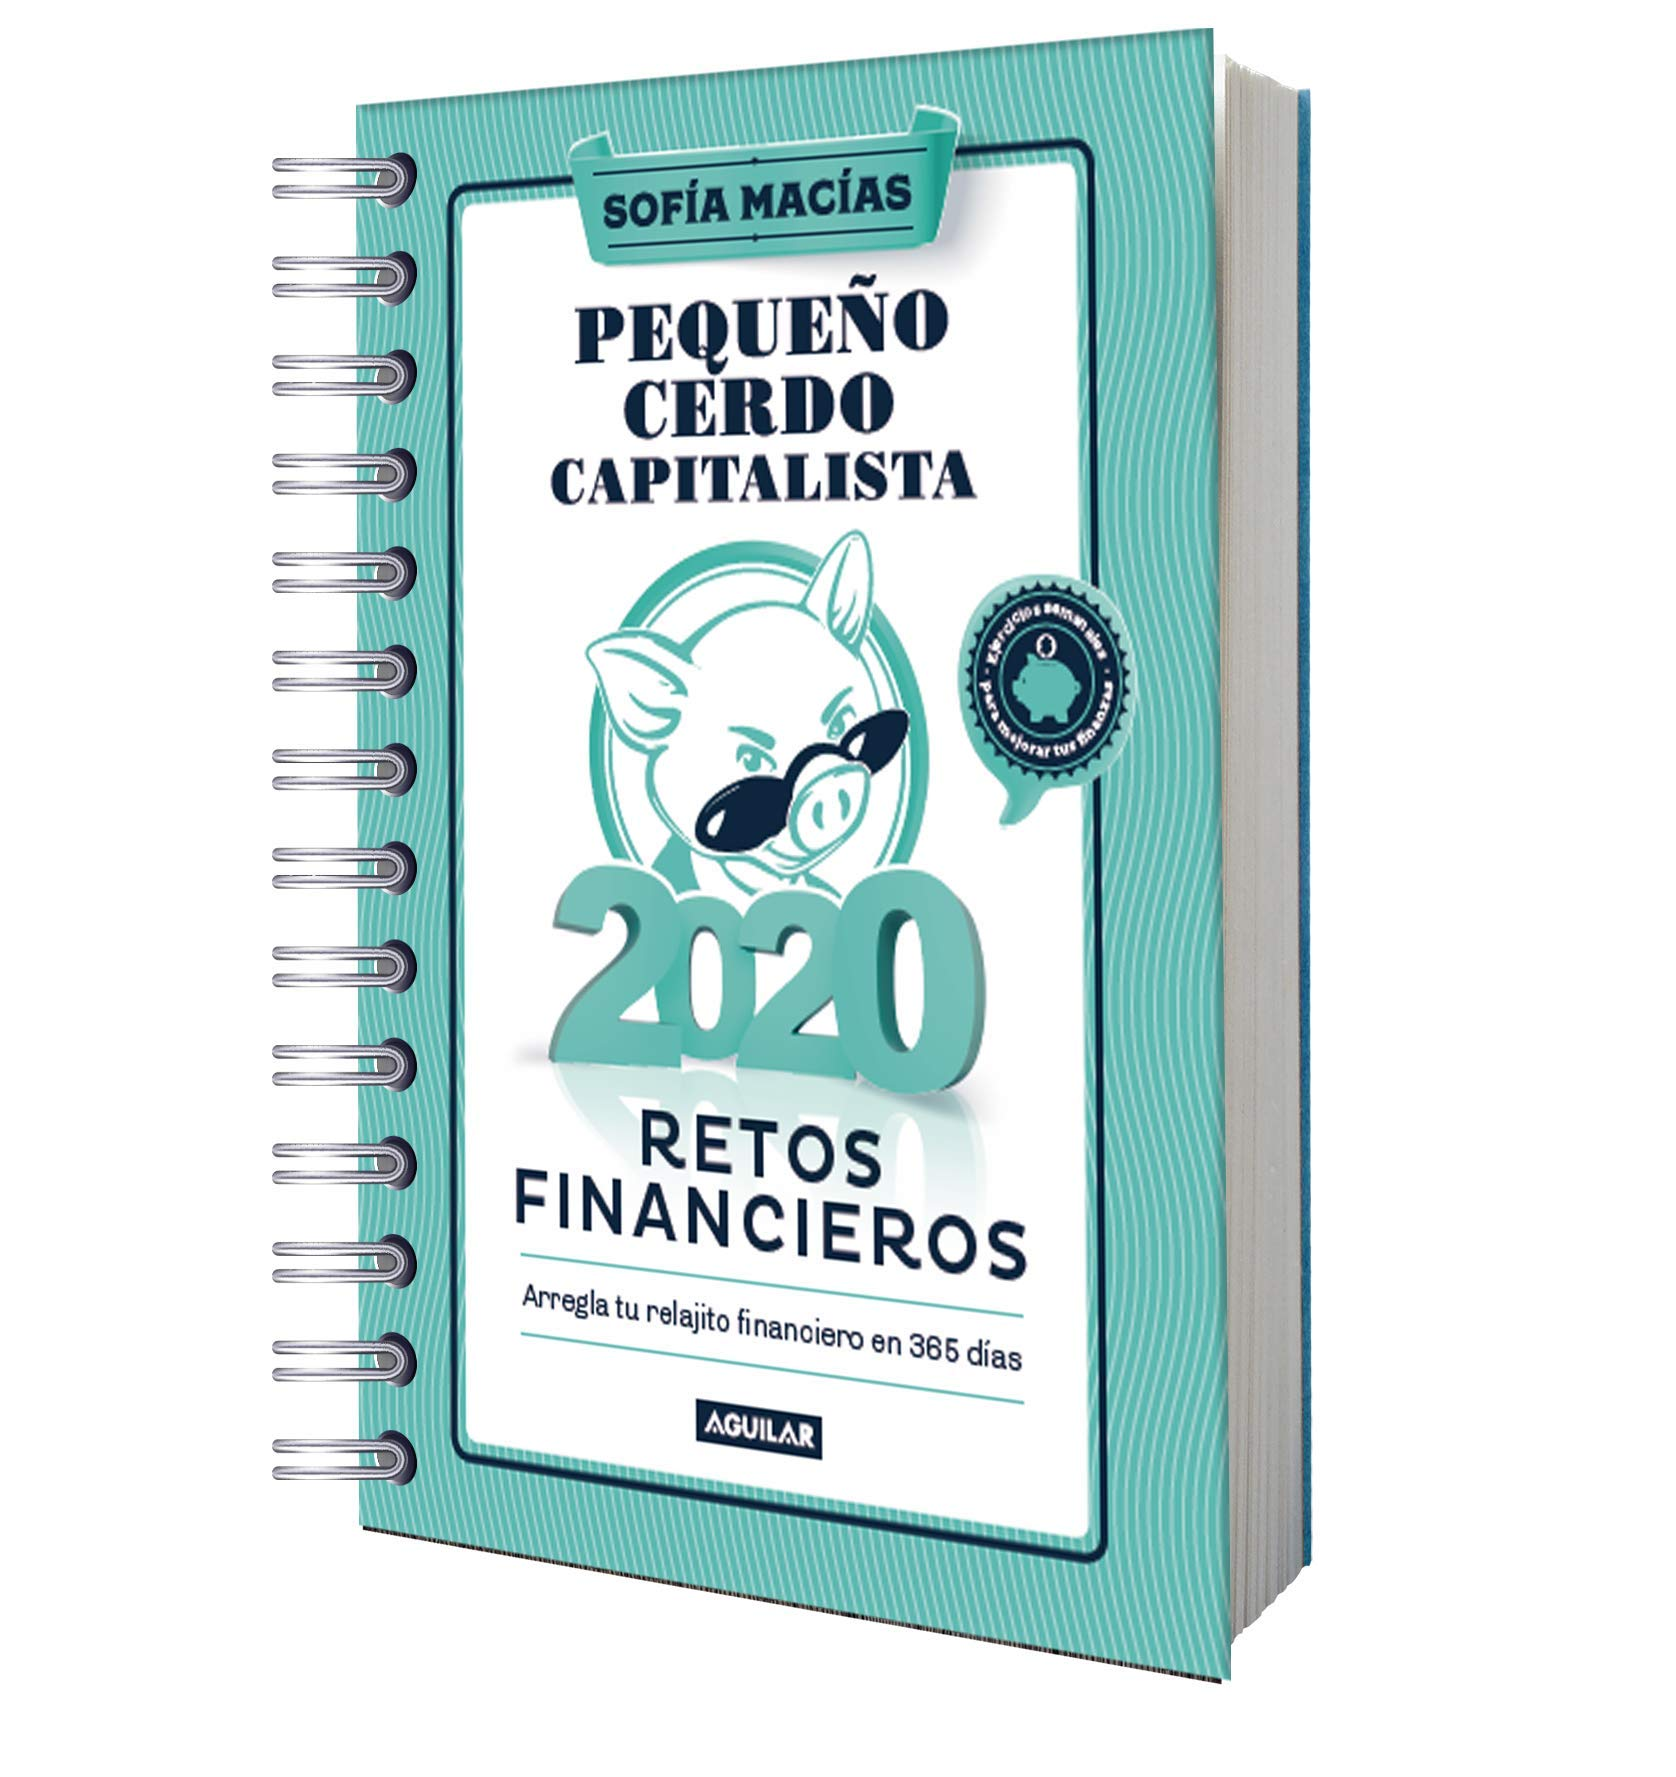 Amazon.com: Libro agenda: Pequeño cerdo capitalista 2020 ...